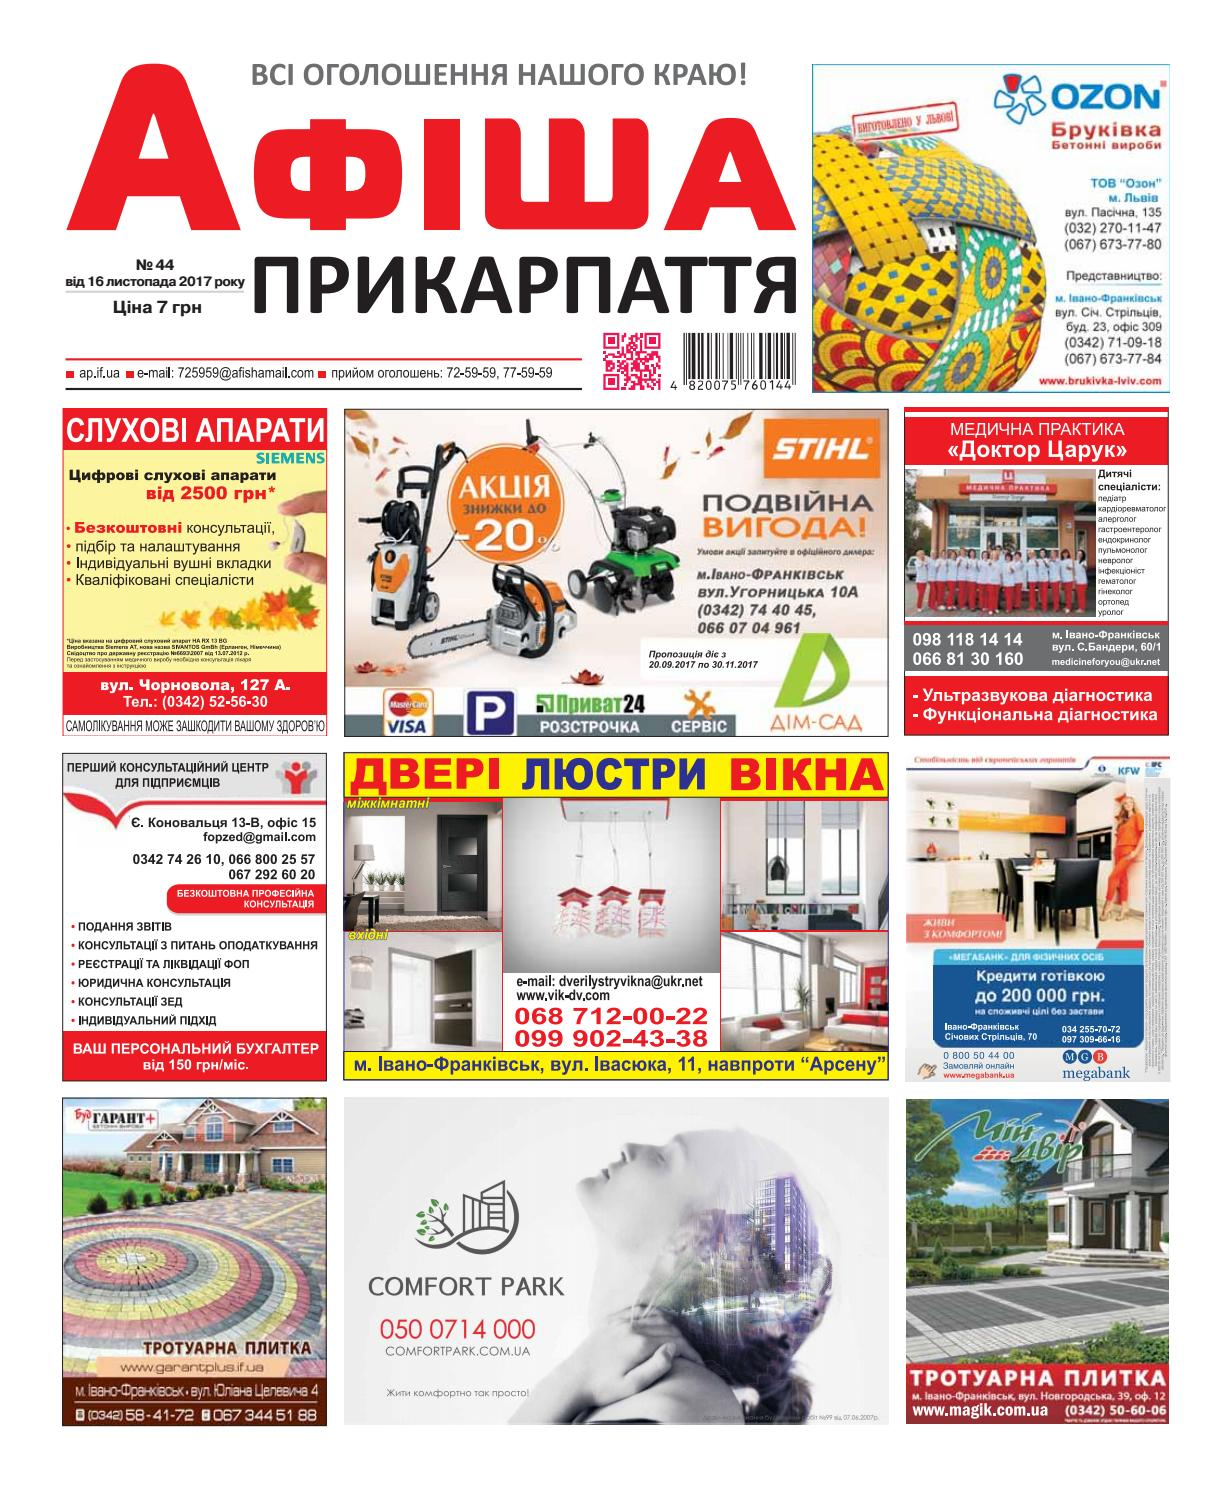 Афіша Прикарпаття 44 by Olya Olya - issuu f9ad38fca8994